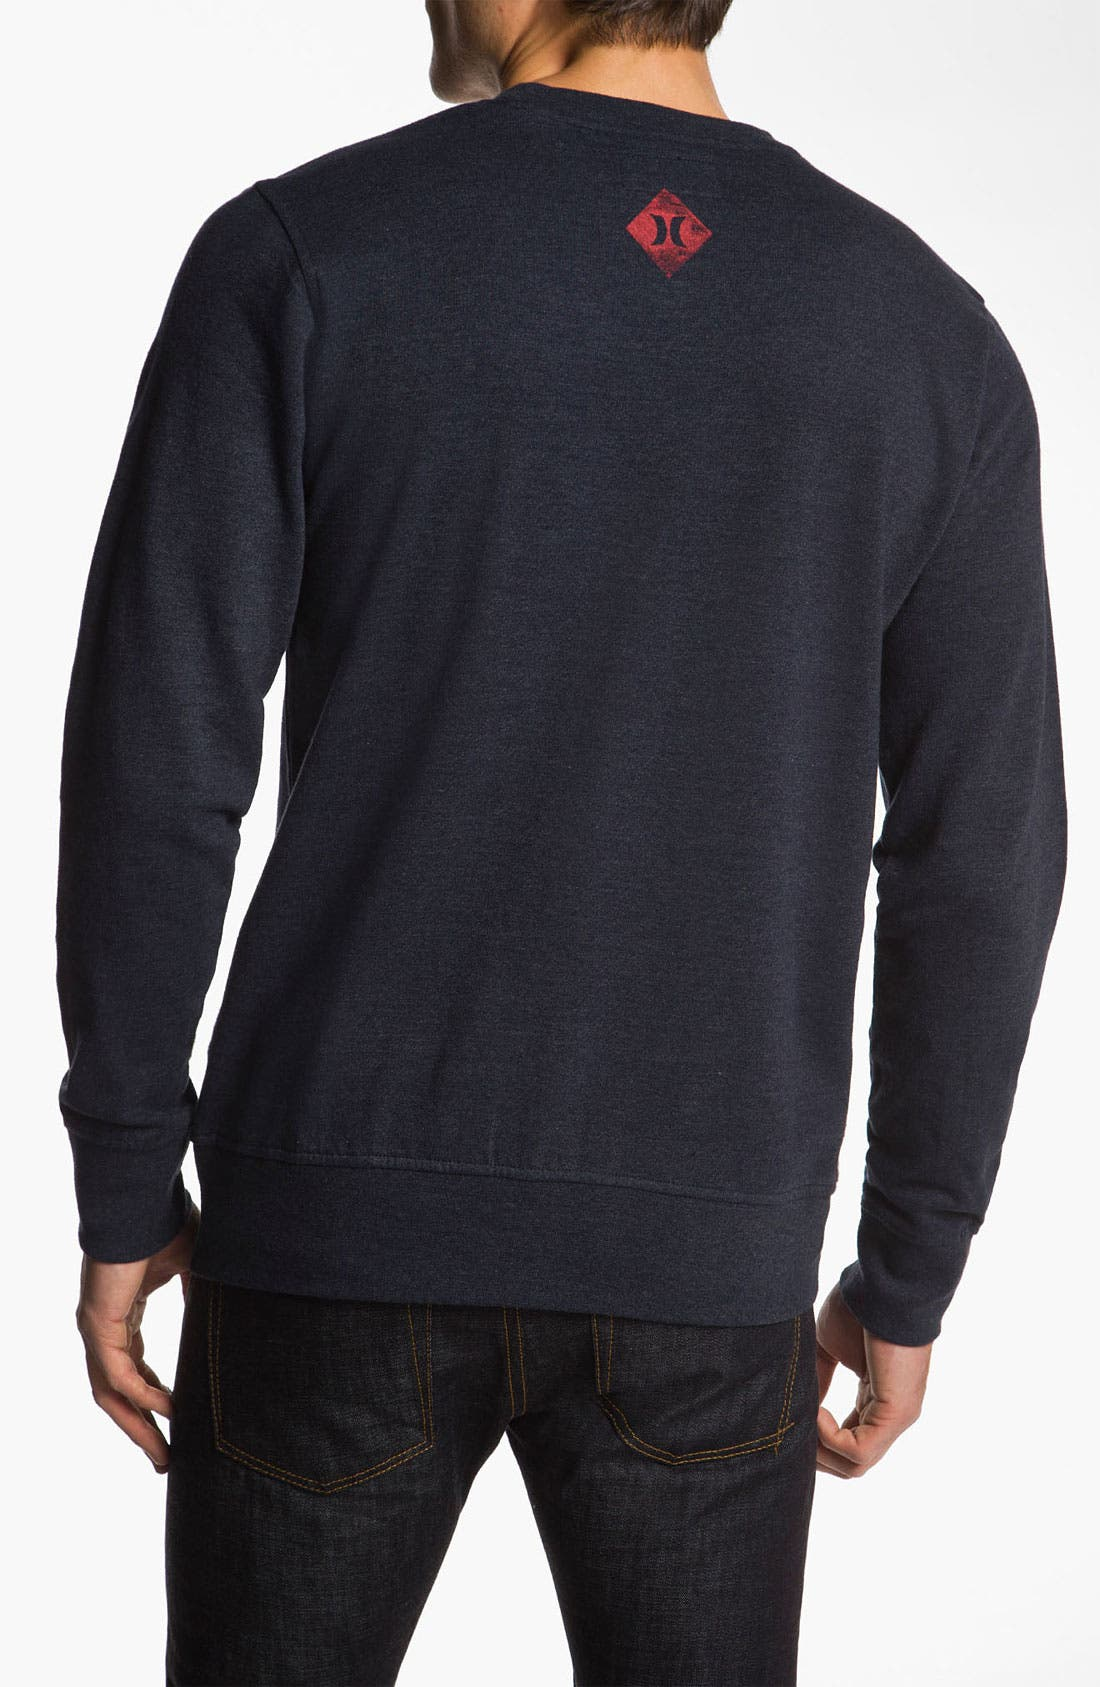 Alternate Image 2  - Hurley 'Striker' Crewneck Sweatshirt